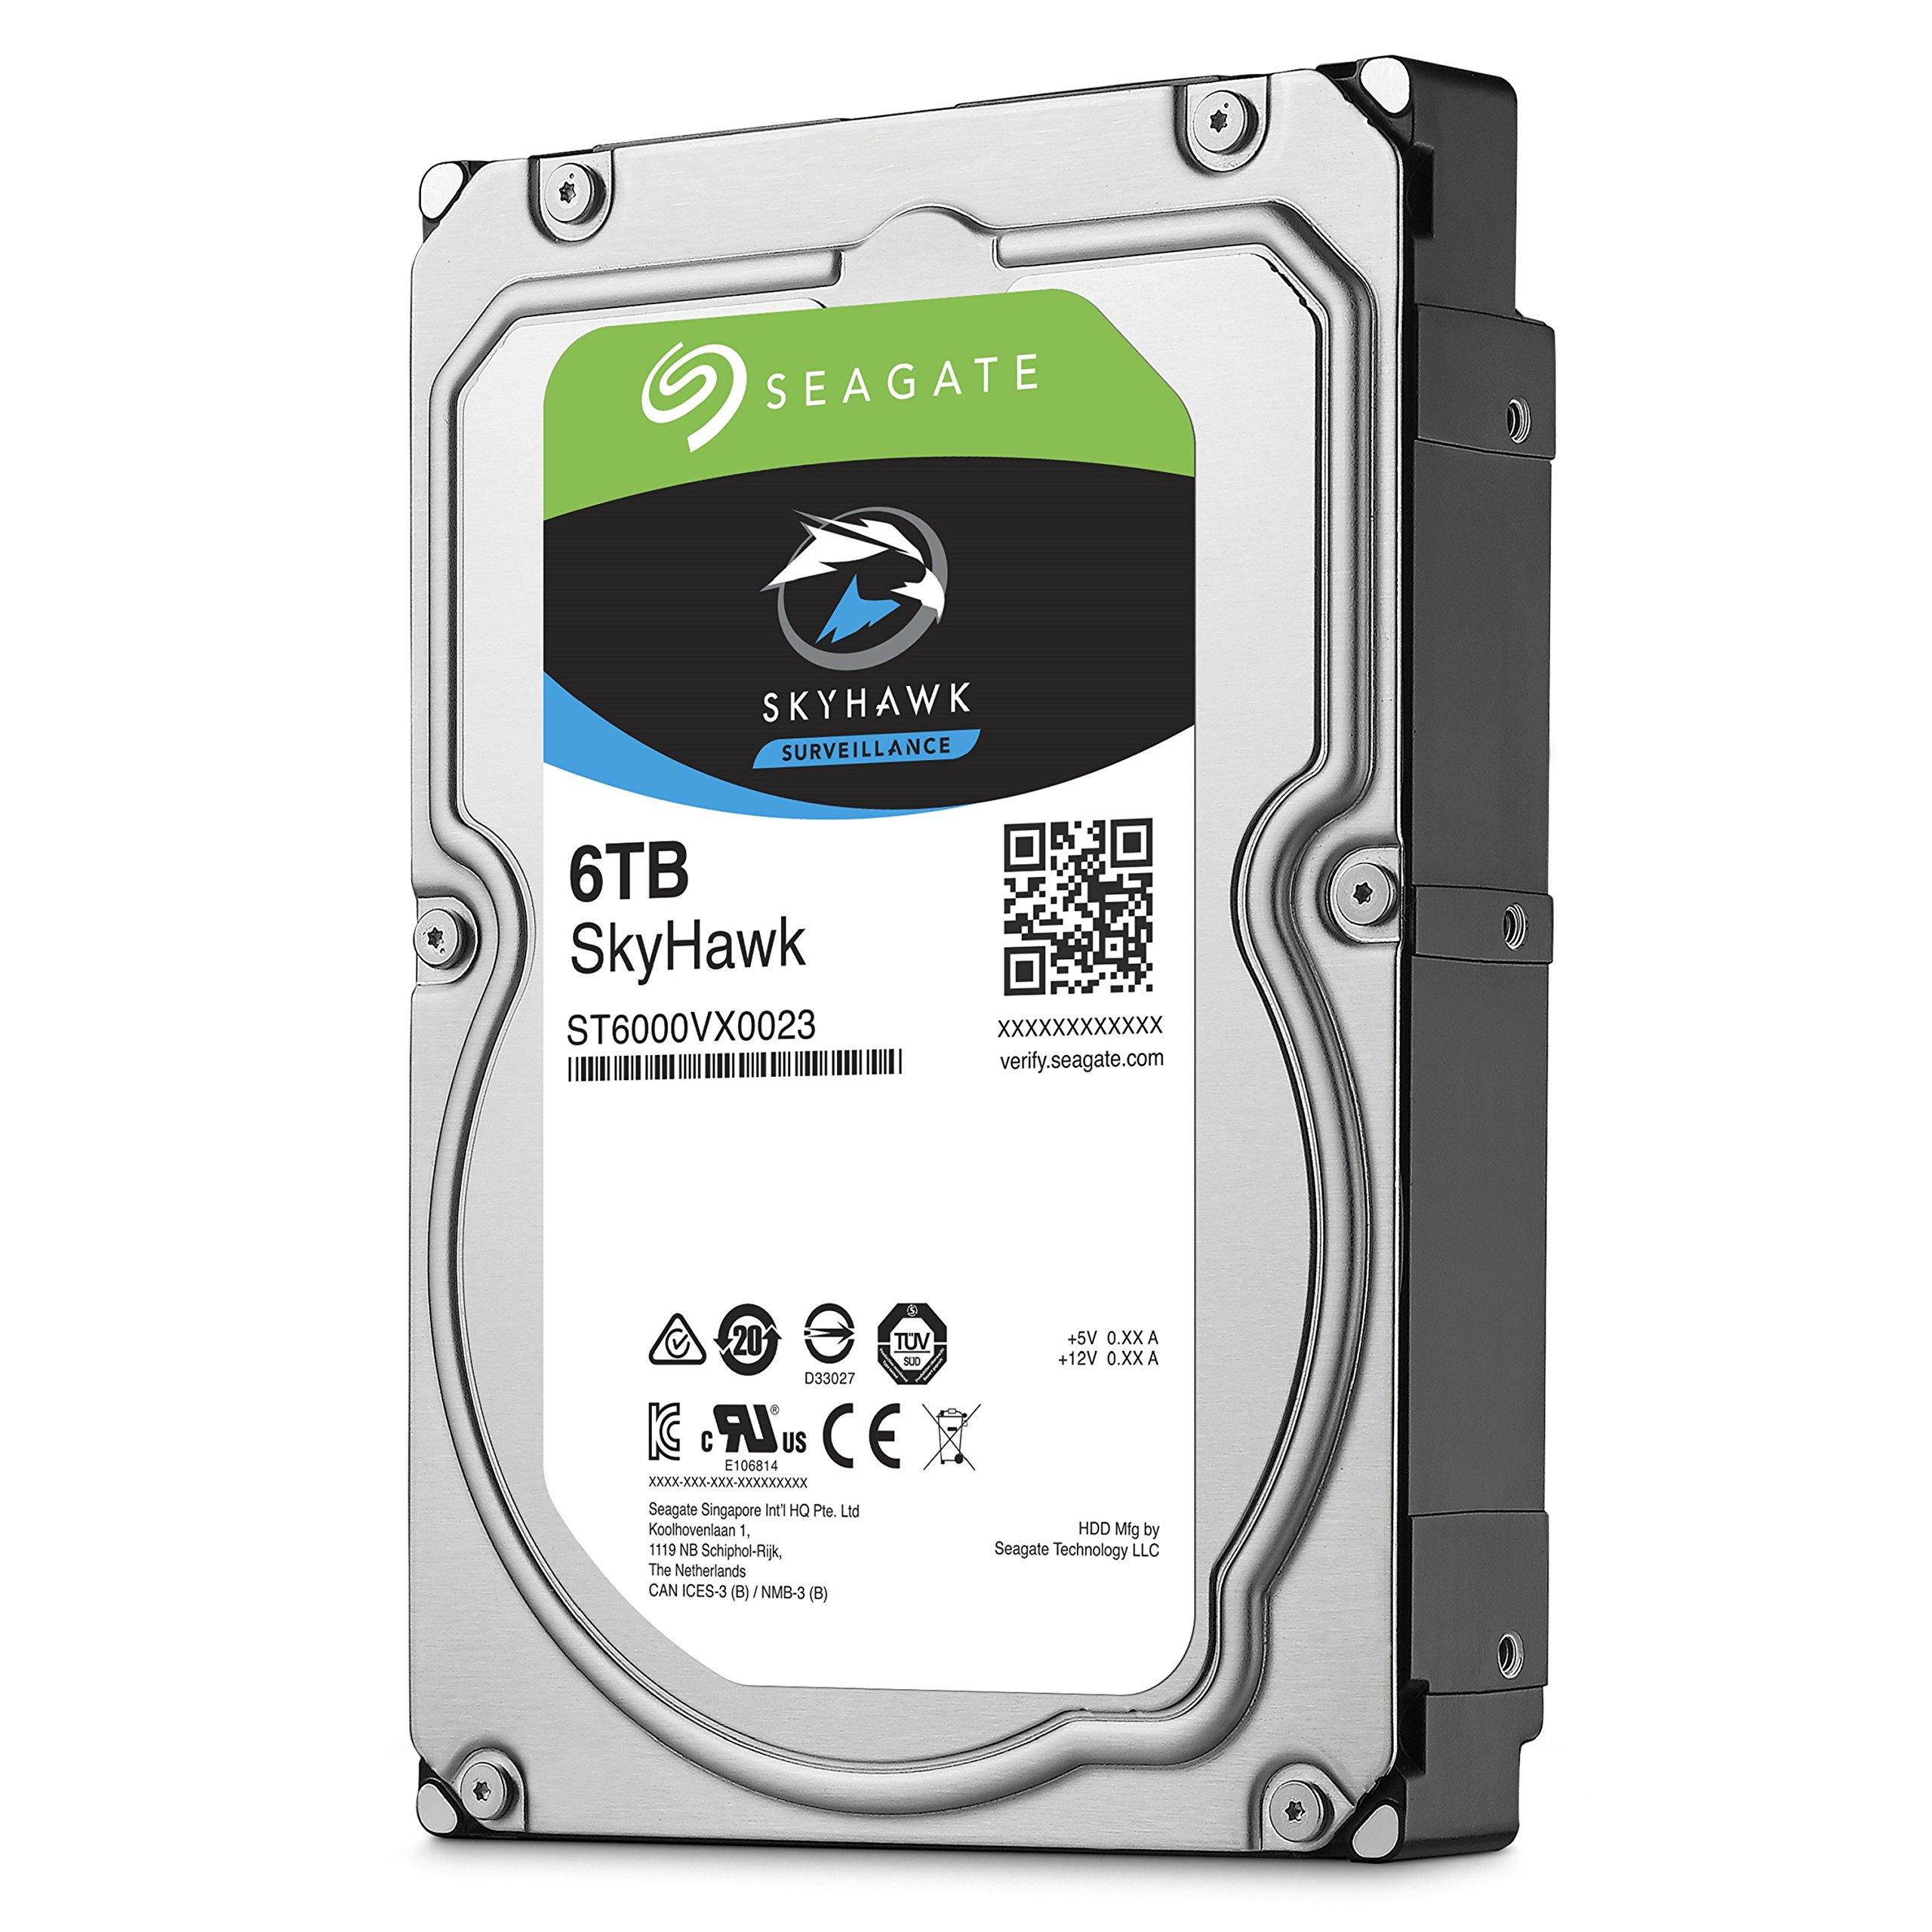 Seagate SkyHawk 6TB Surveillance Hard Drive - SATA 6Gb/s 128MB Cache 3.5-Inch Internal Drive (ST6000VX0023) by Seagate (Image #4)